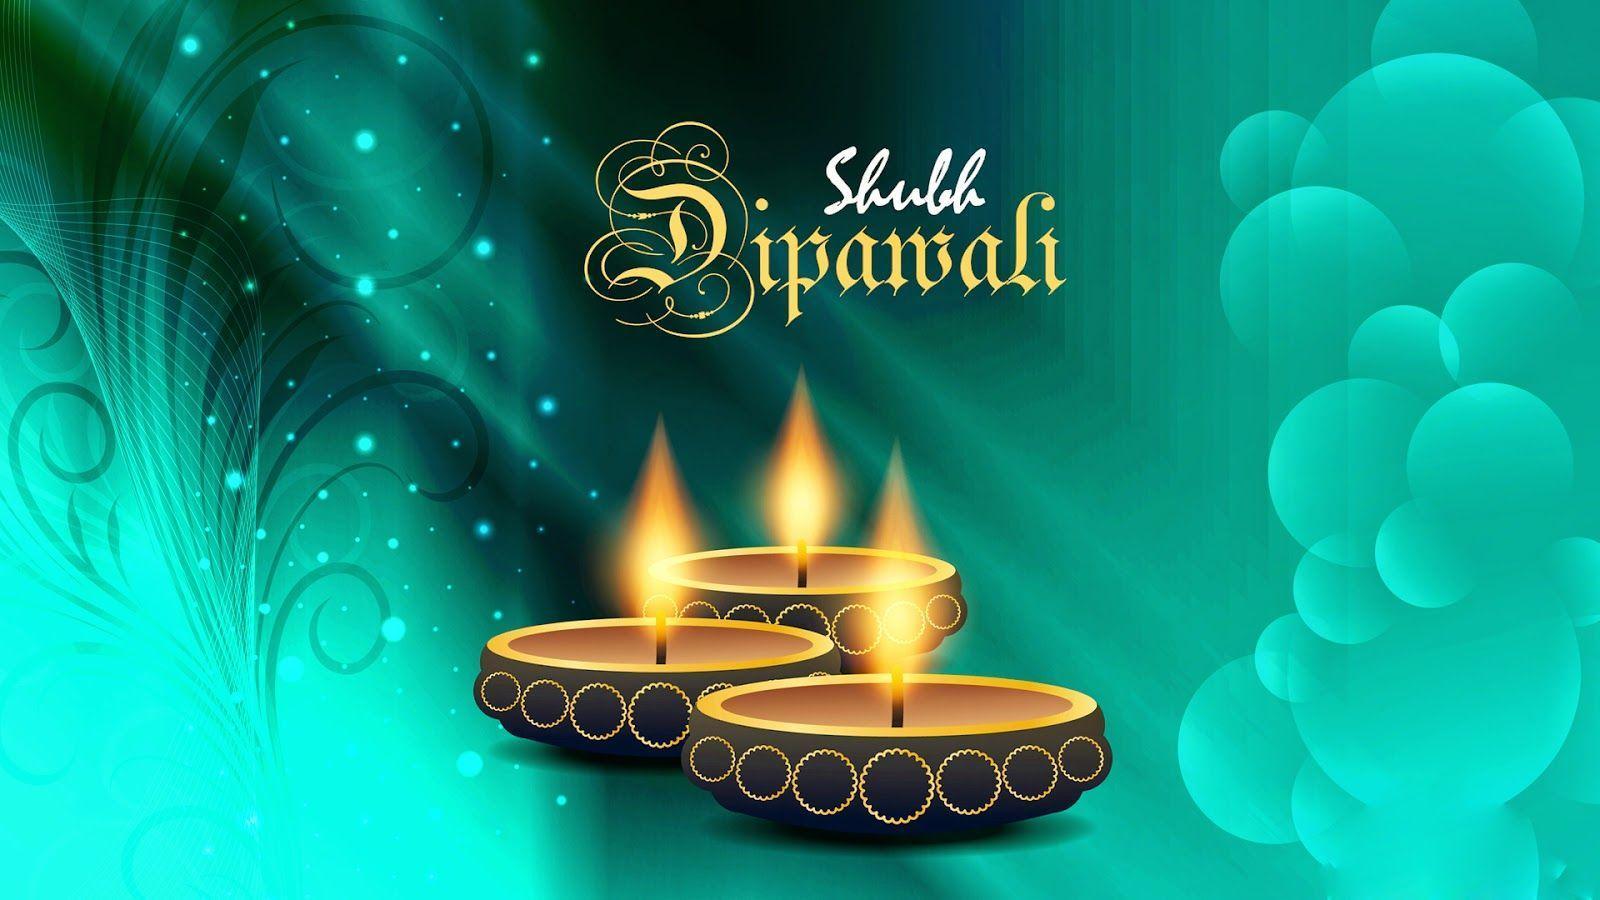 Diwali Wallpapers,Diwali Pictures,Wallpapers of Diwali,Wallpaper ...